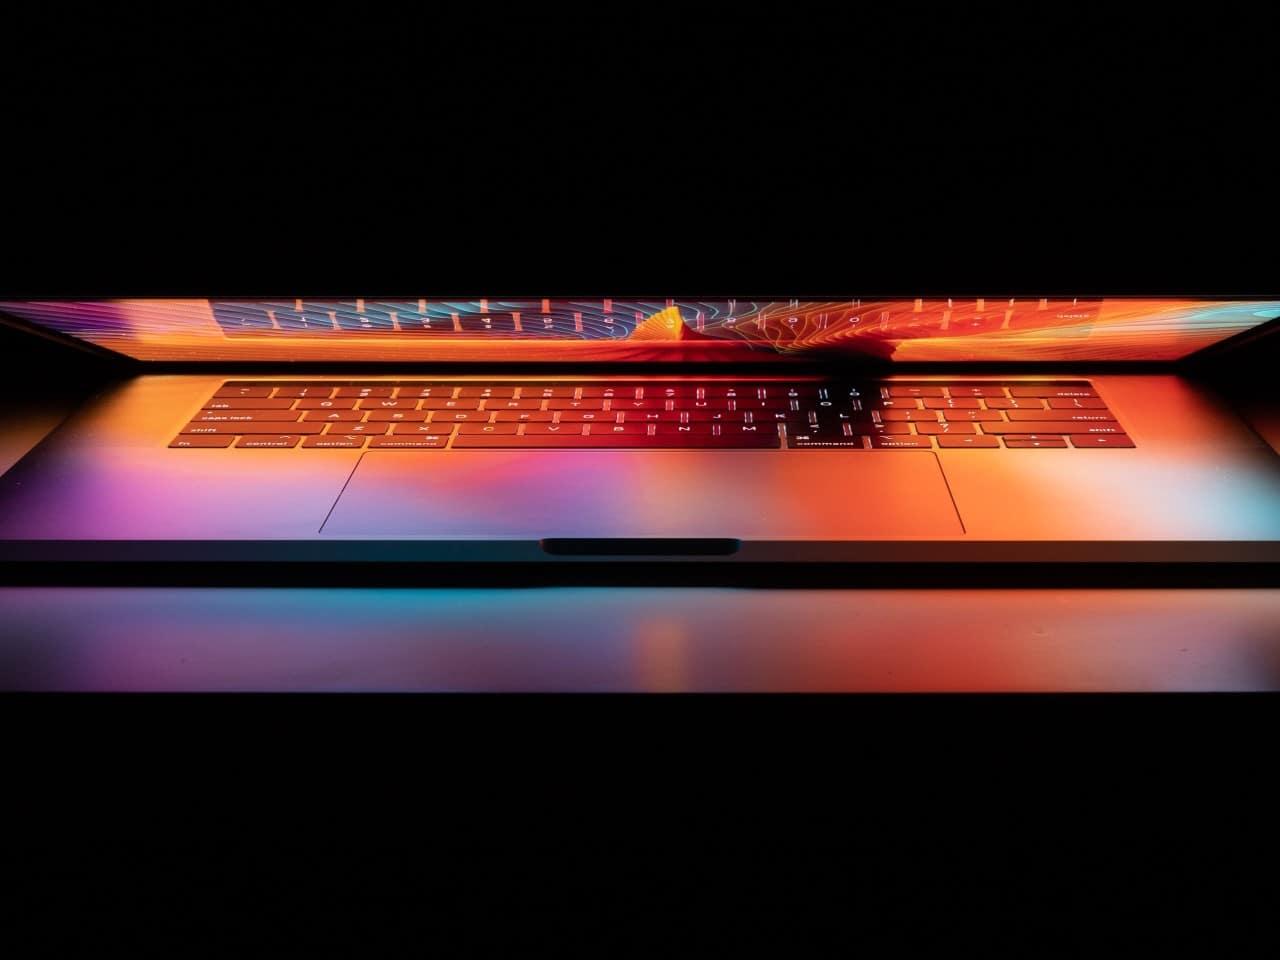 Cibersexo, qué es